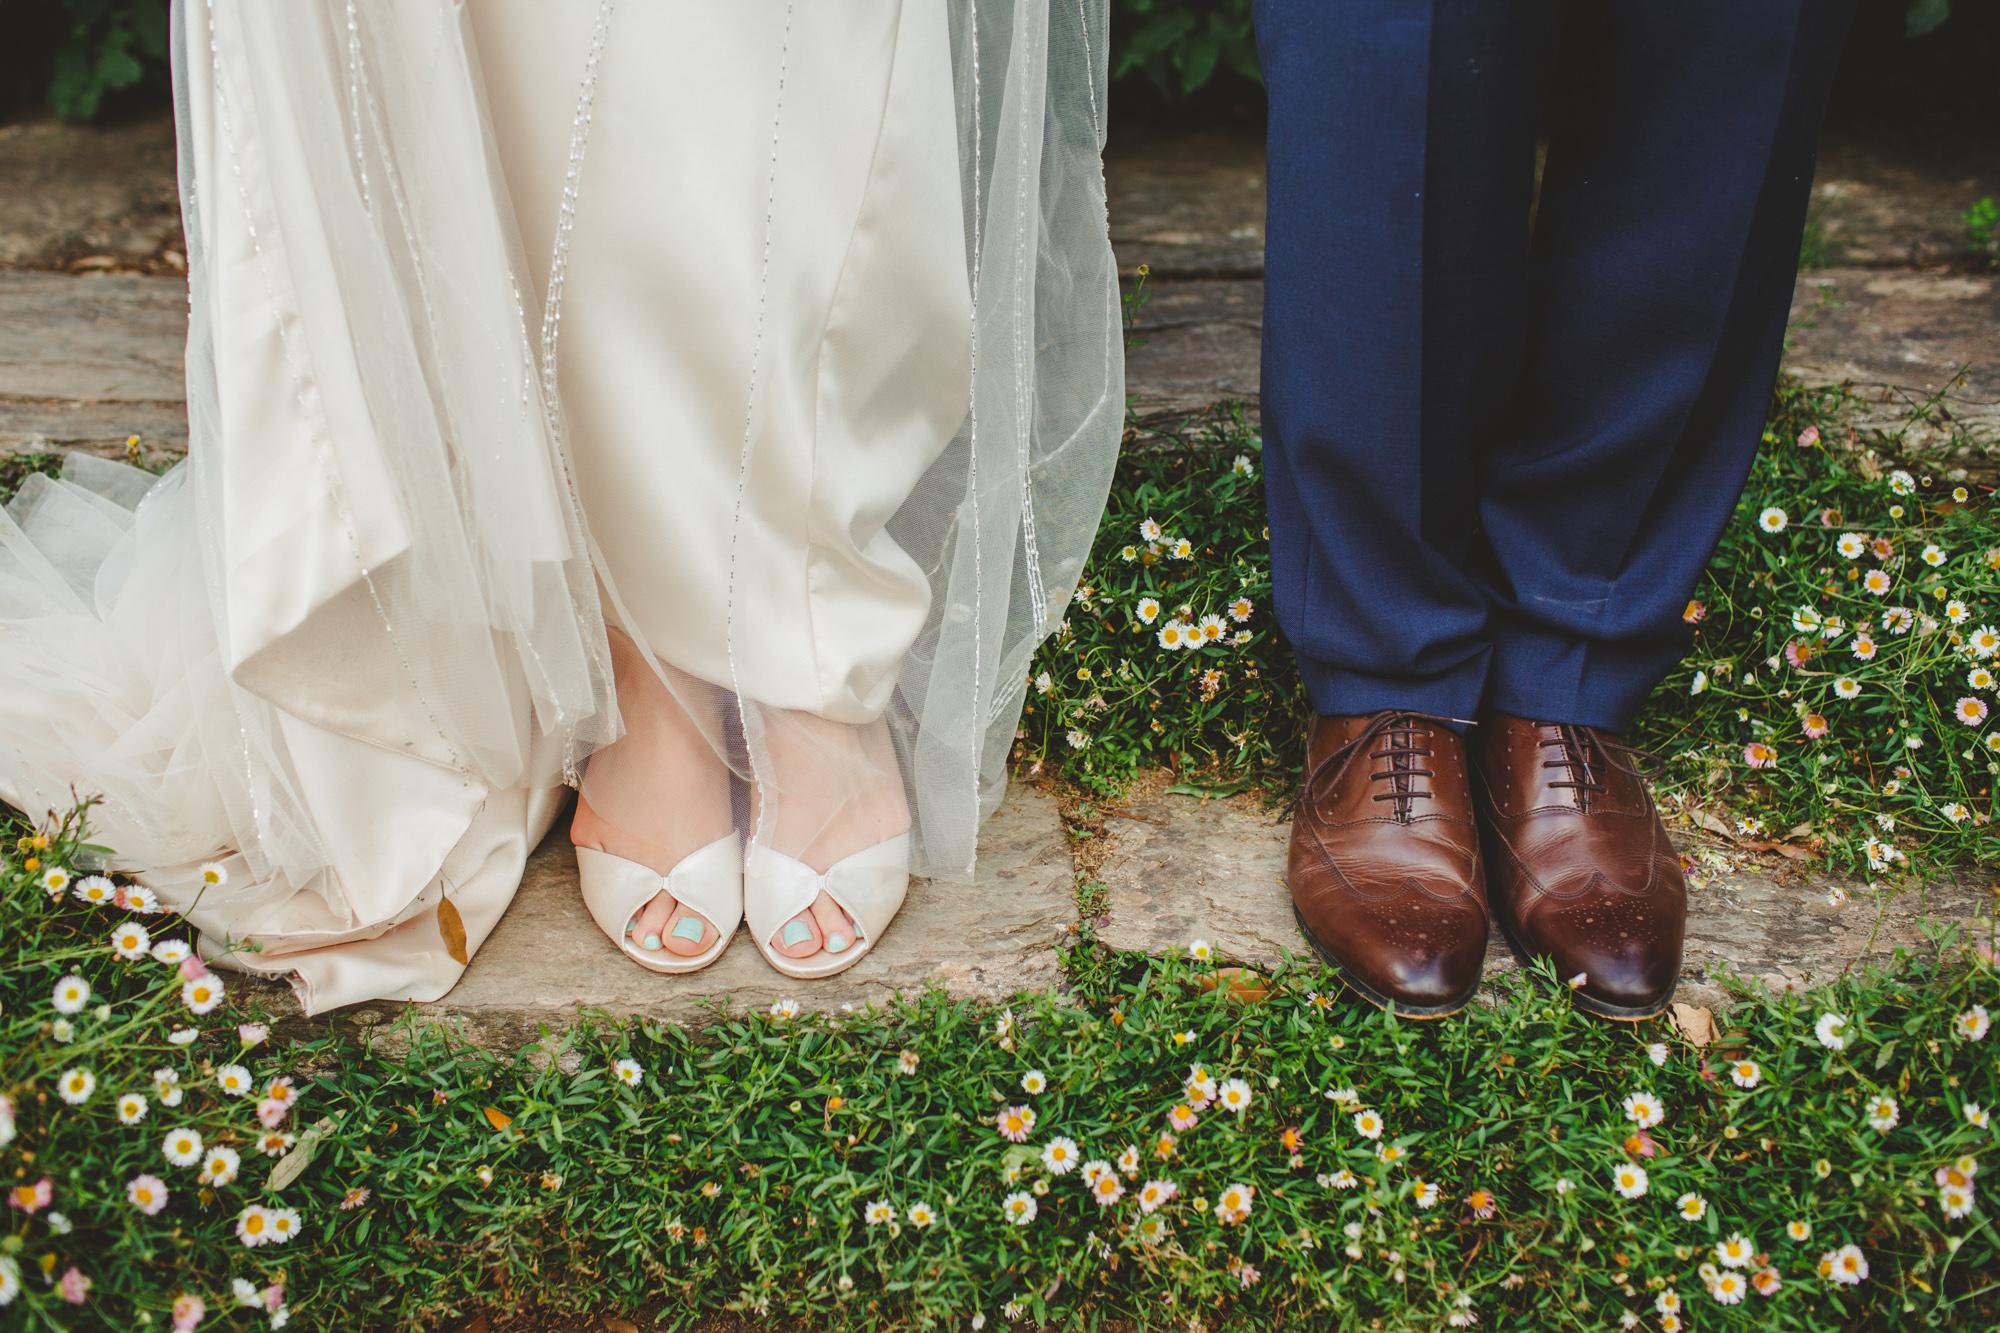 hestercombe-taunton-wedding-photography-camera-hannah-17.jpg